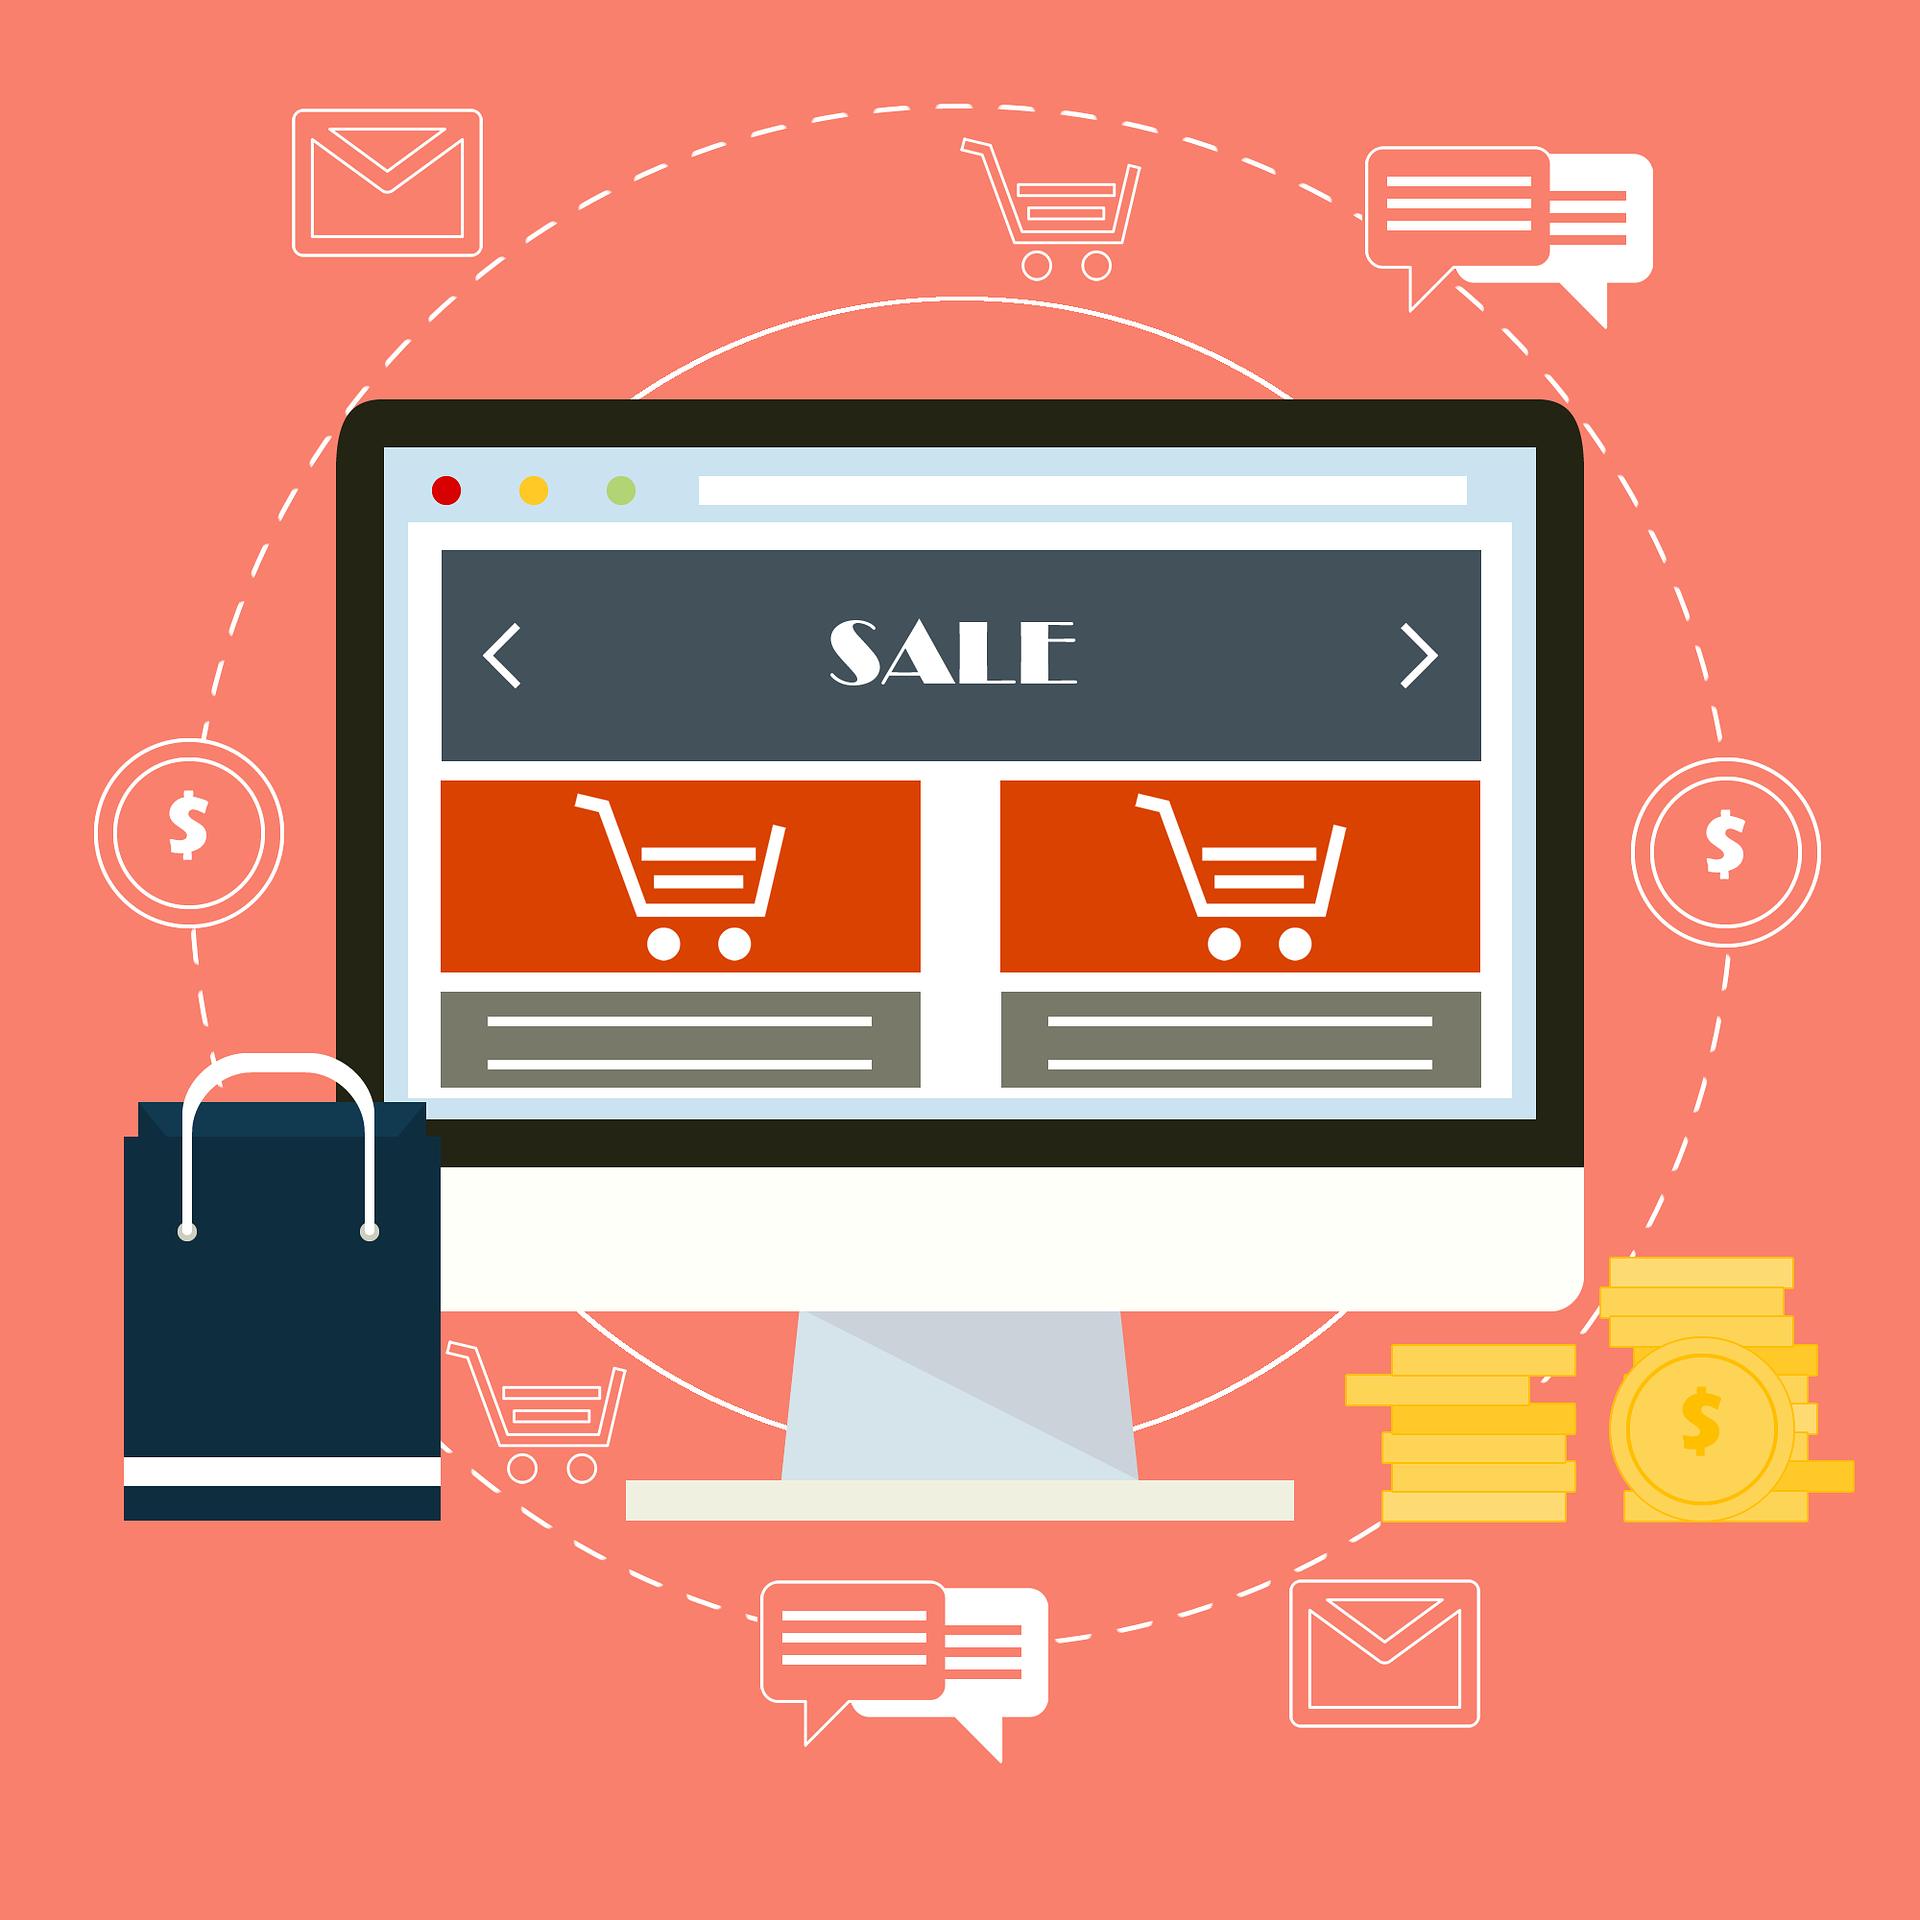 API Integration and create the Amazon Affiliate Store